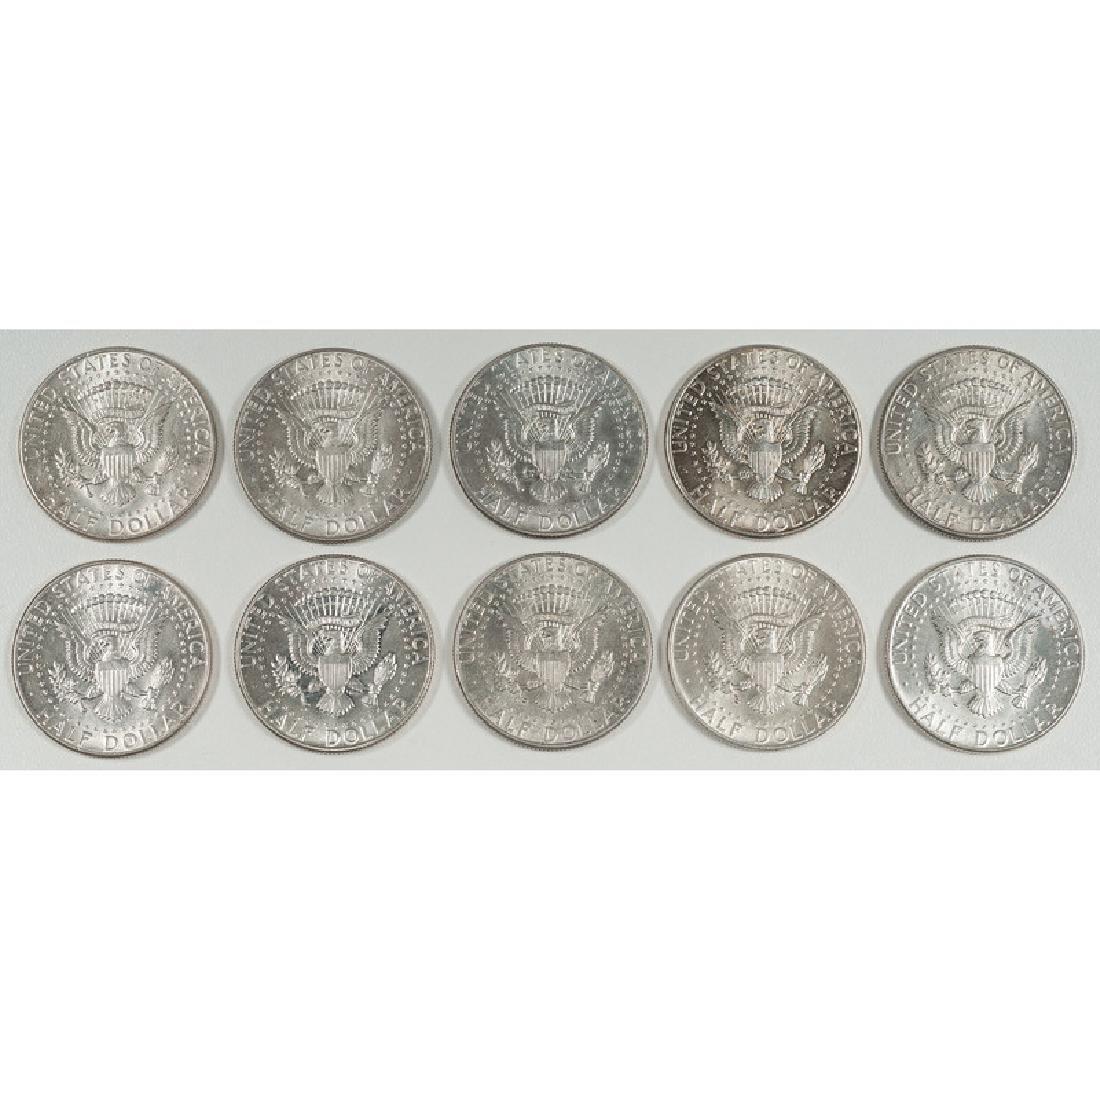 United States Kennedy Half Dollars 1964-1967 - 2